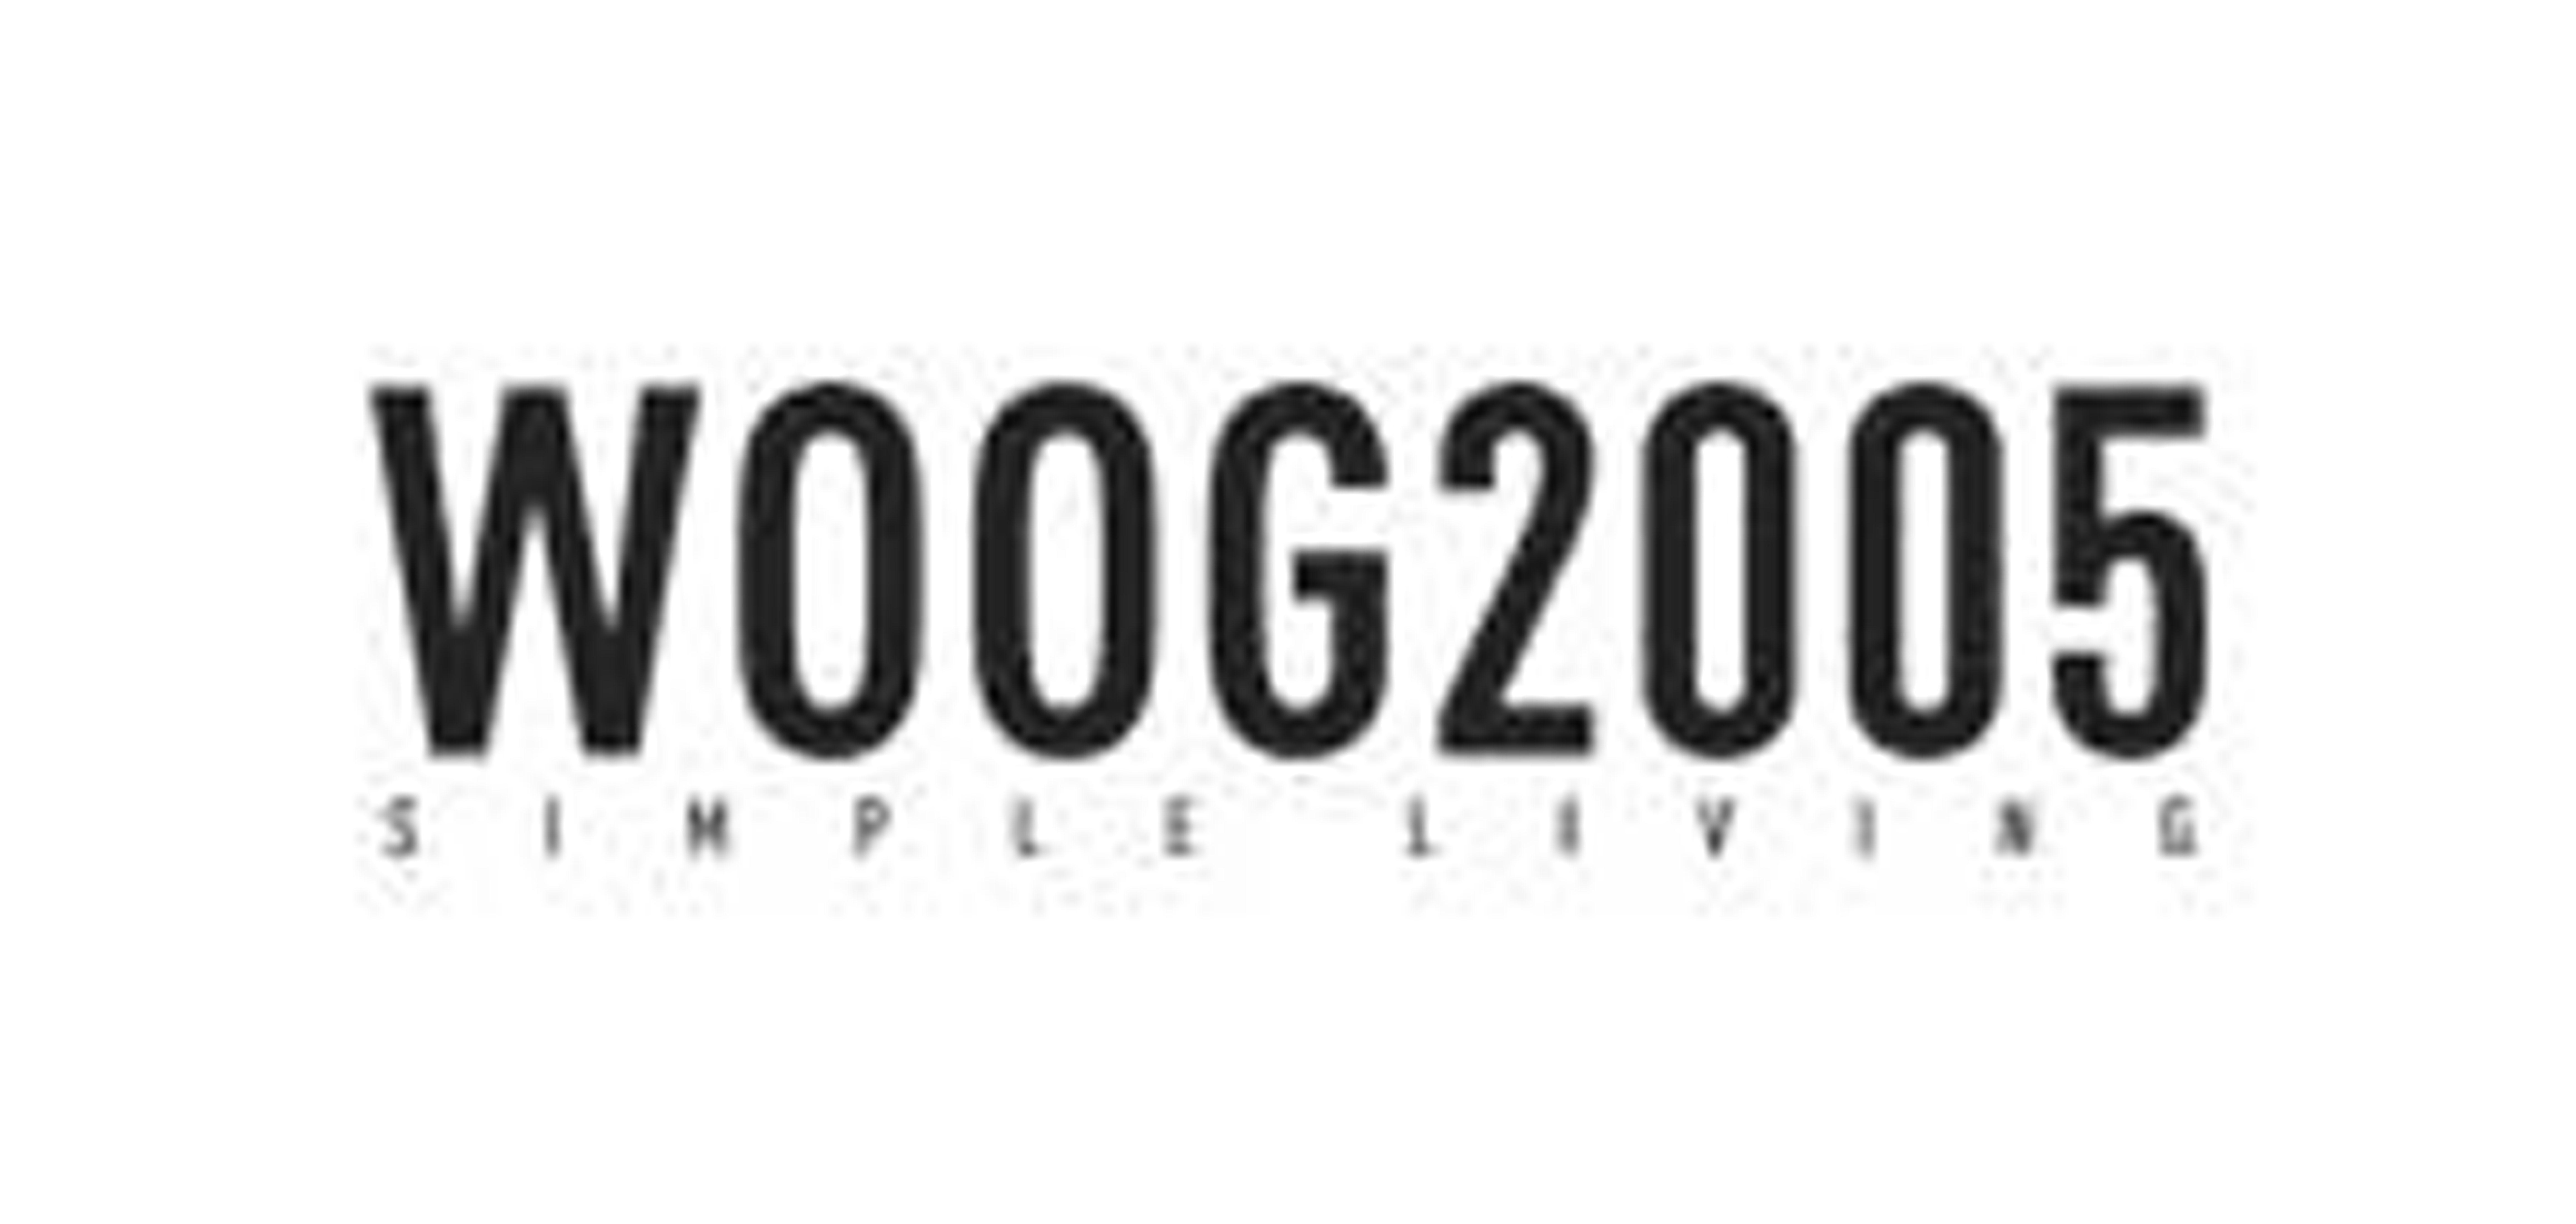 WOOG2005是什么牌子_WOOG2005品牌怎么样?